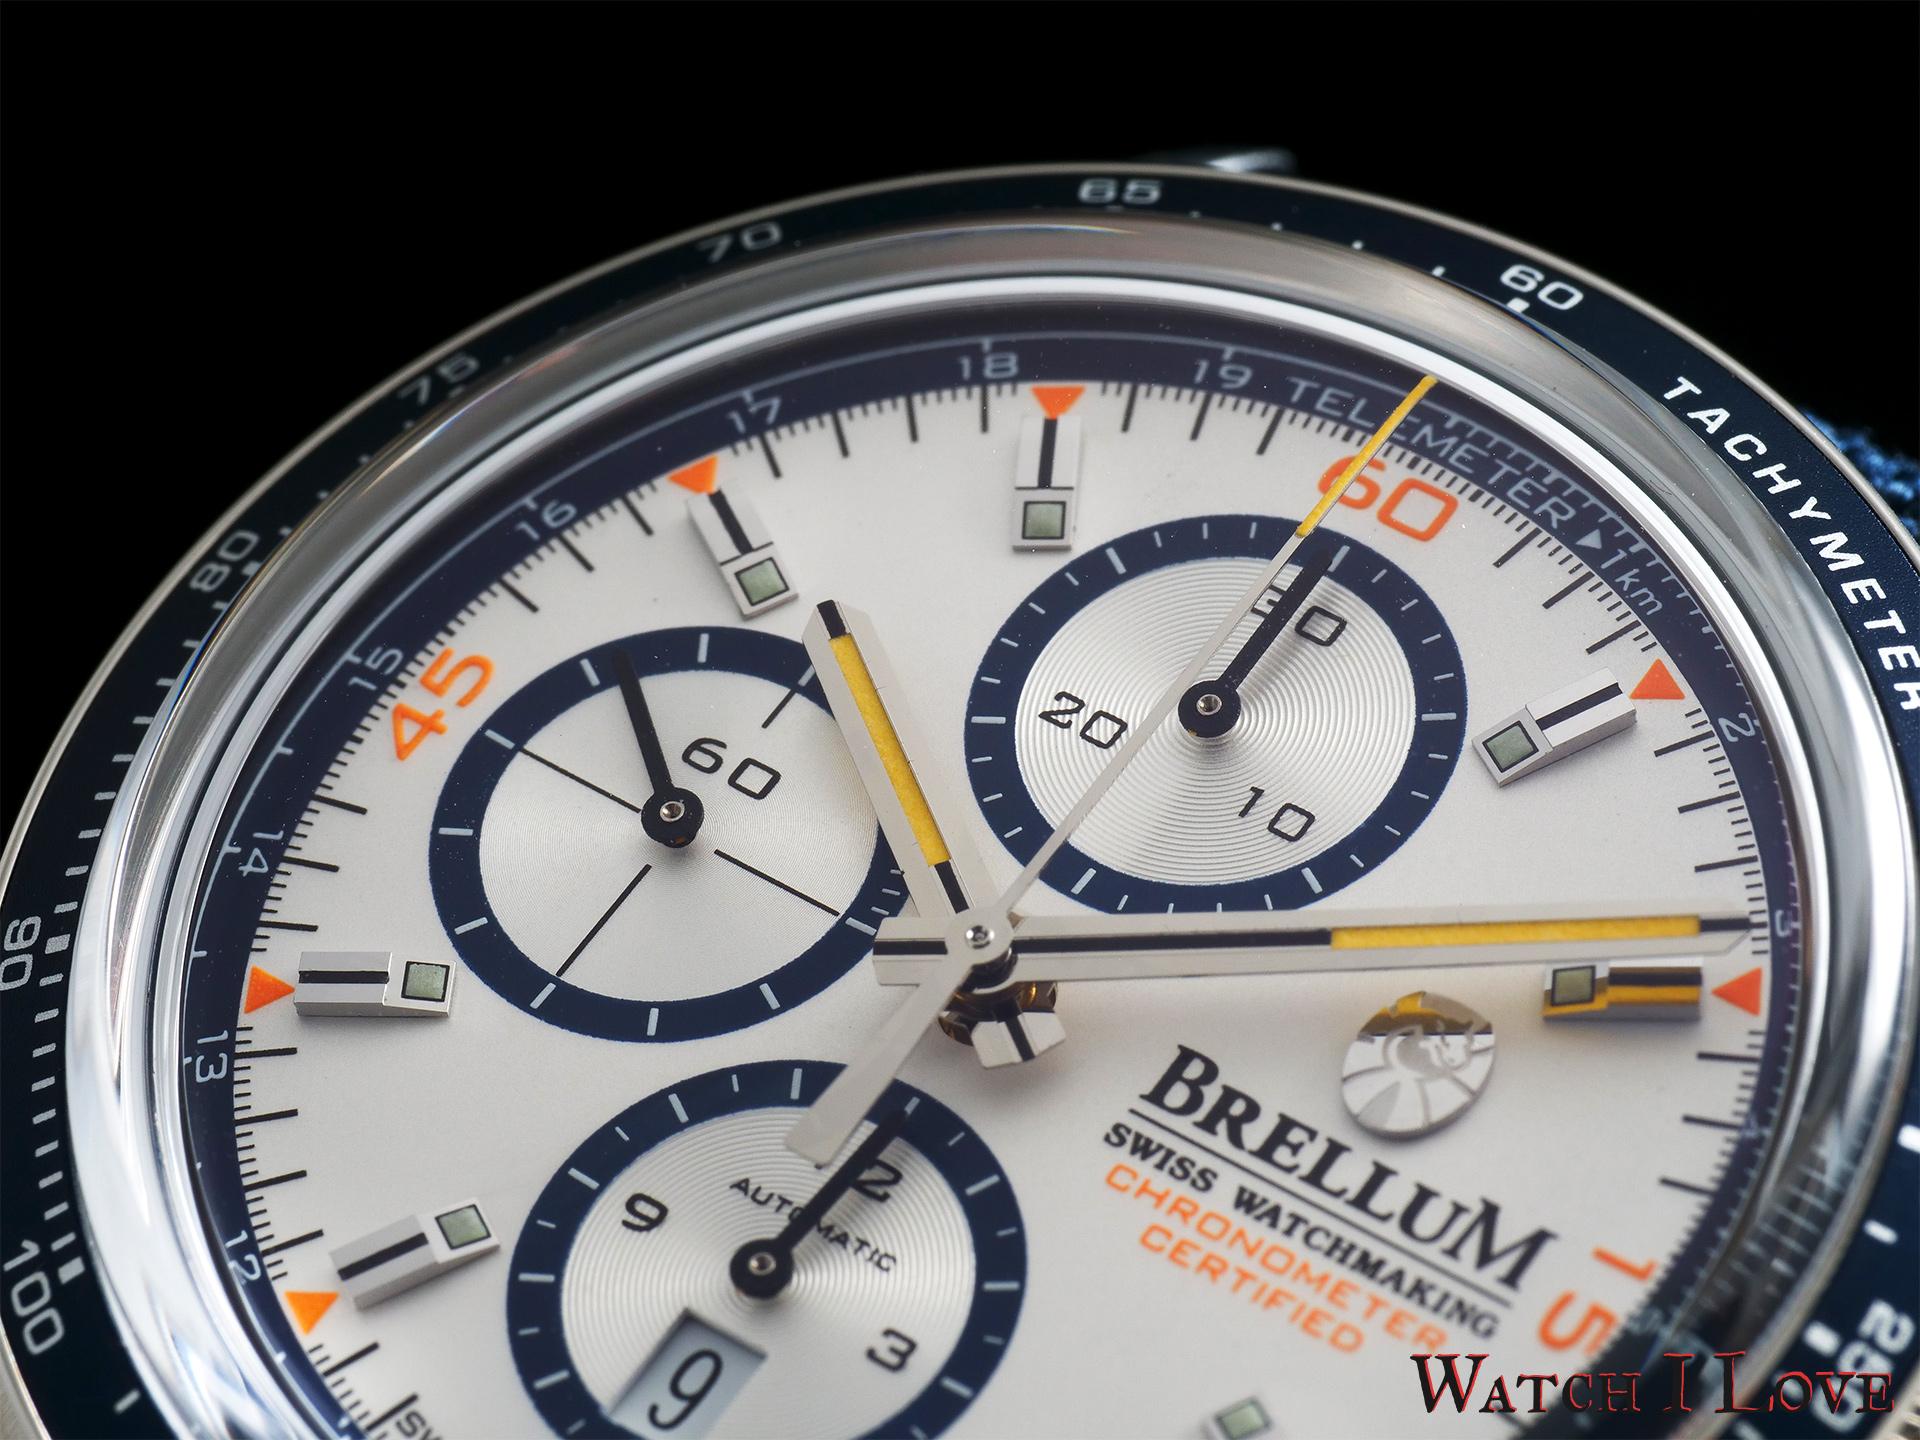 Brellum-Pandial-Marina-2-Chronometer-dial-detail